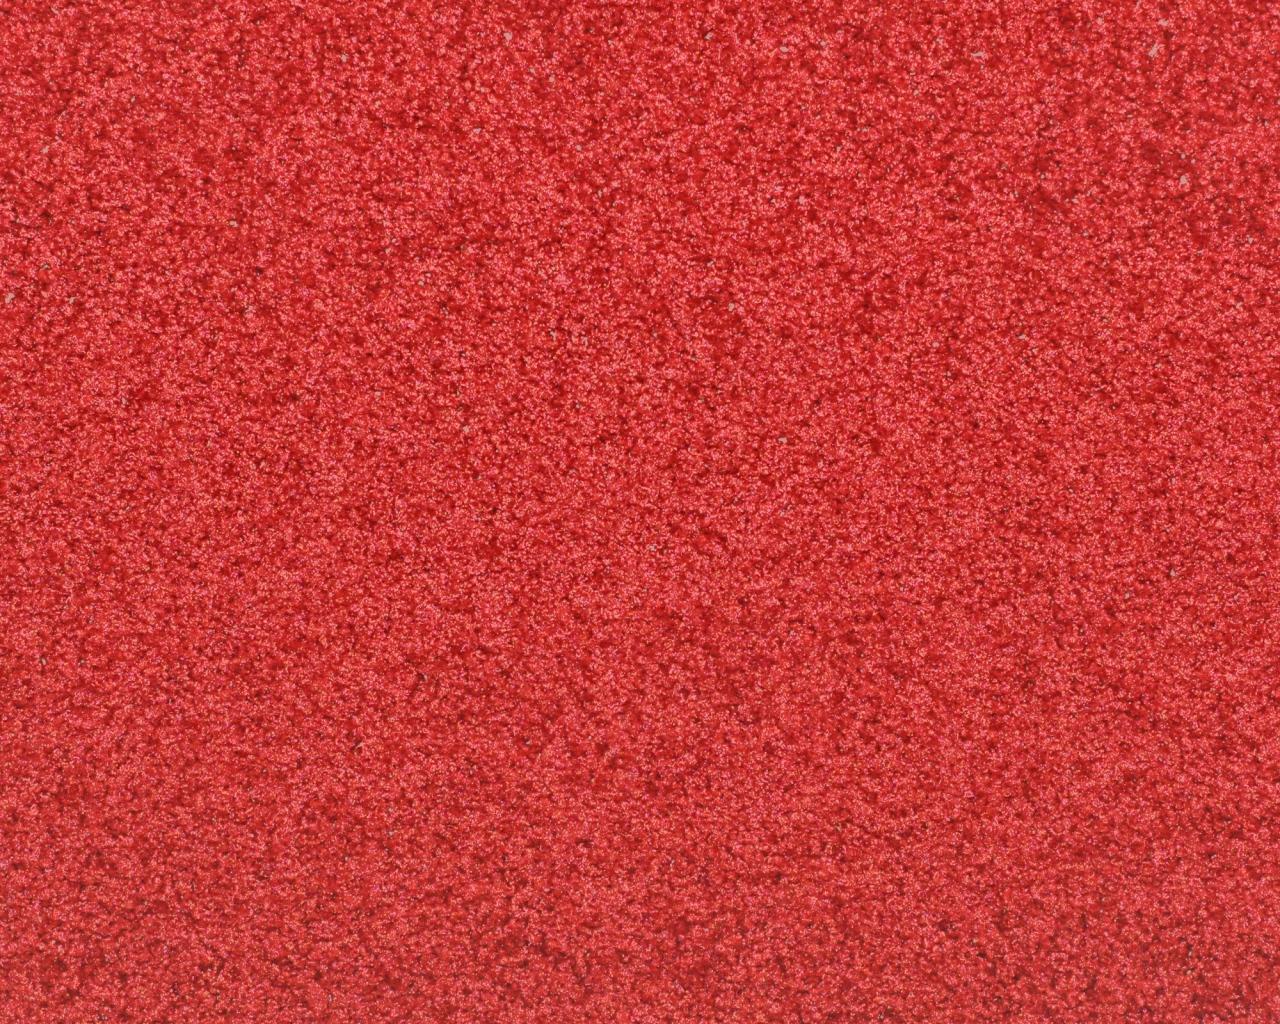 Red Carpet Wallpaper 1280x1024